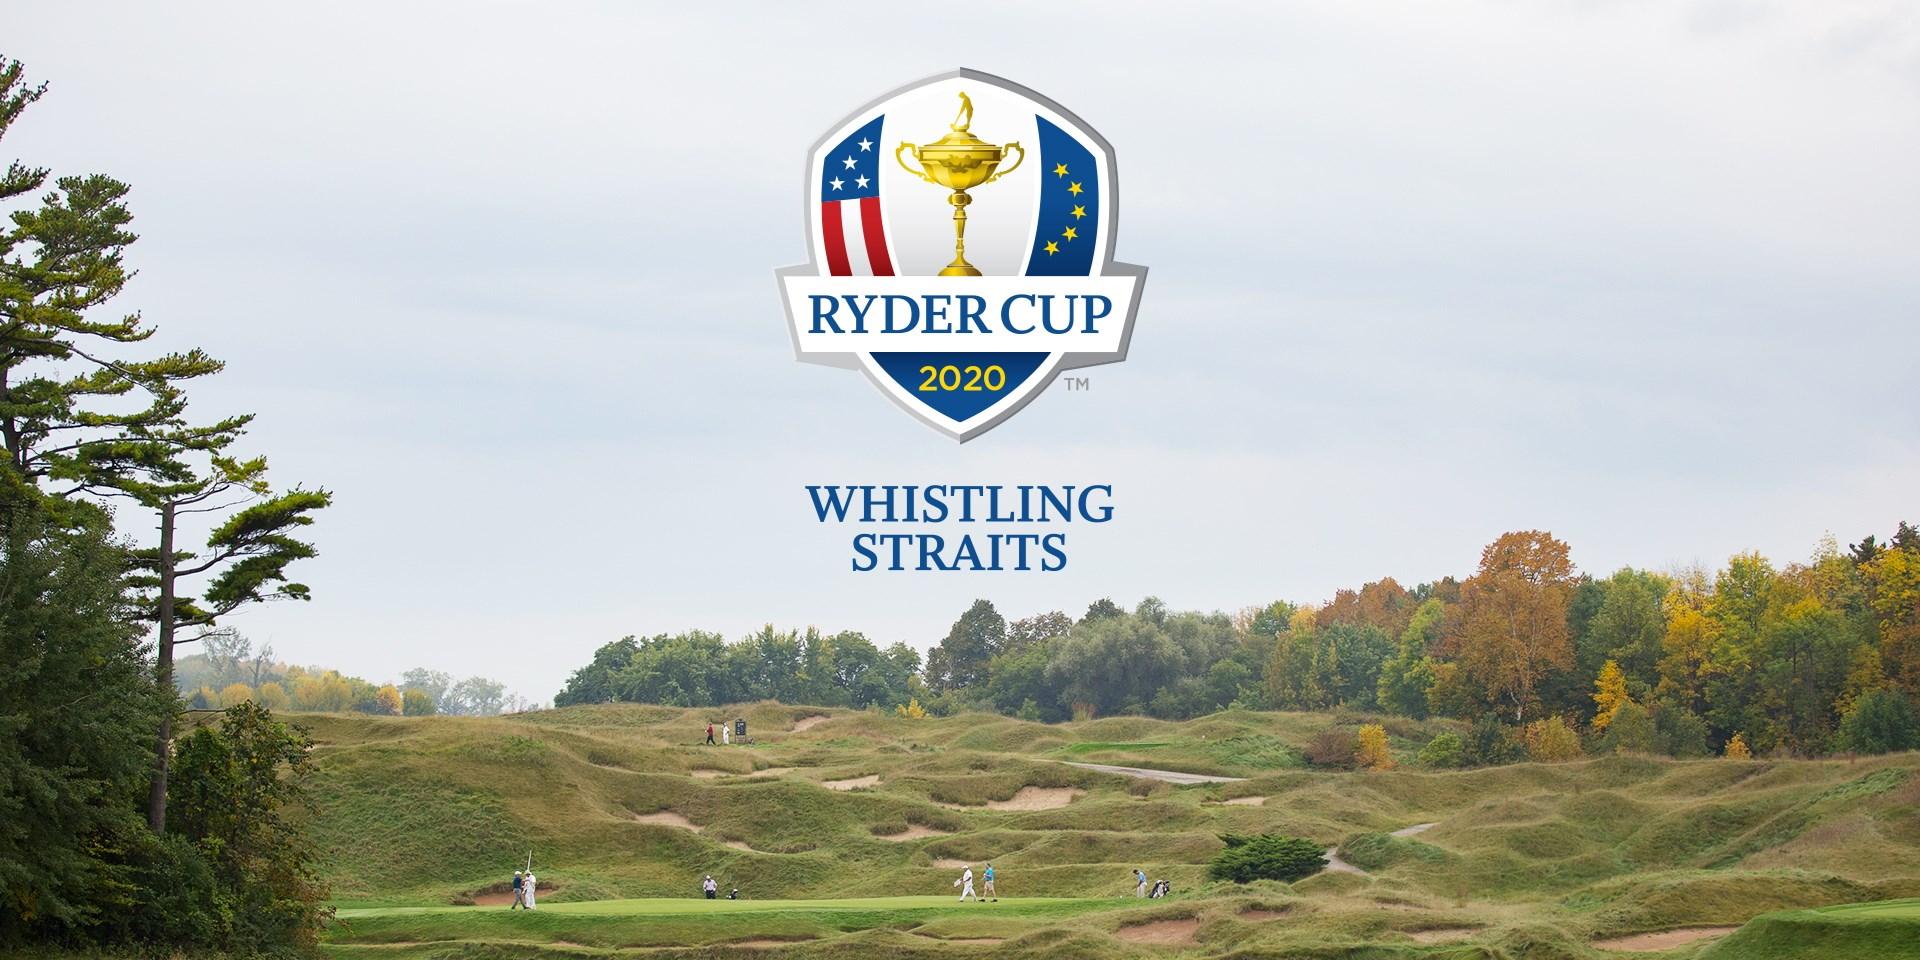 Ryder Cup 2020 Package – Whistling Straits, Kohler, Wisconsin